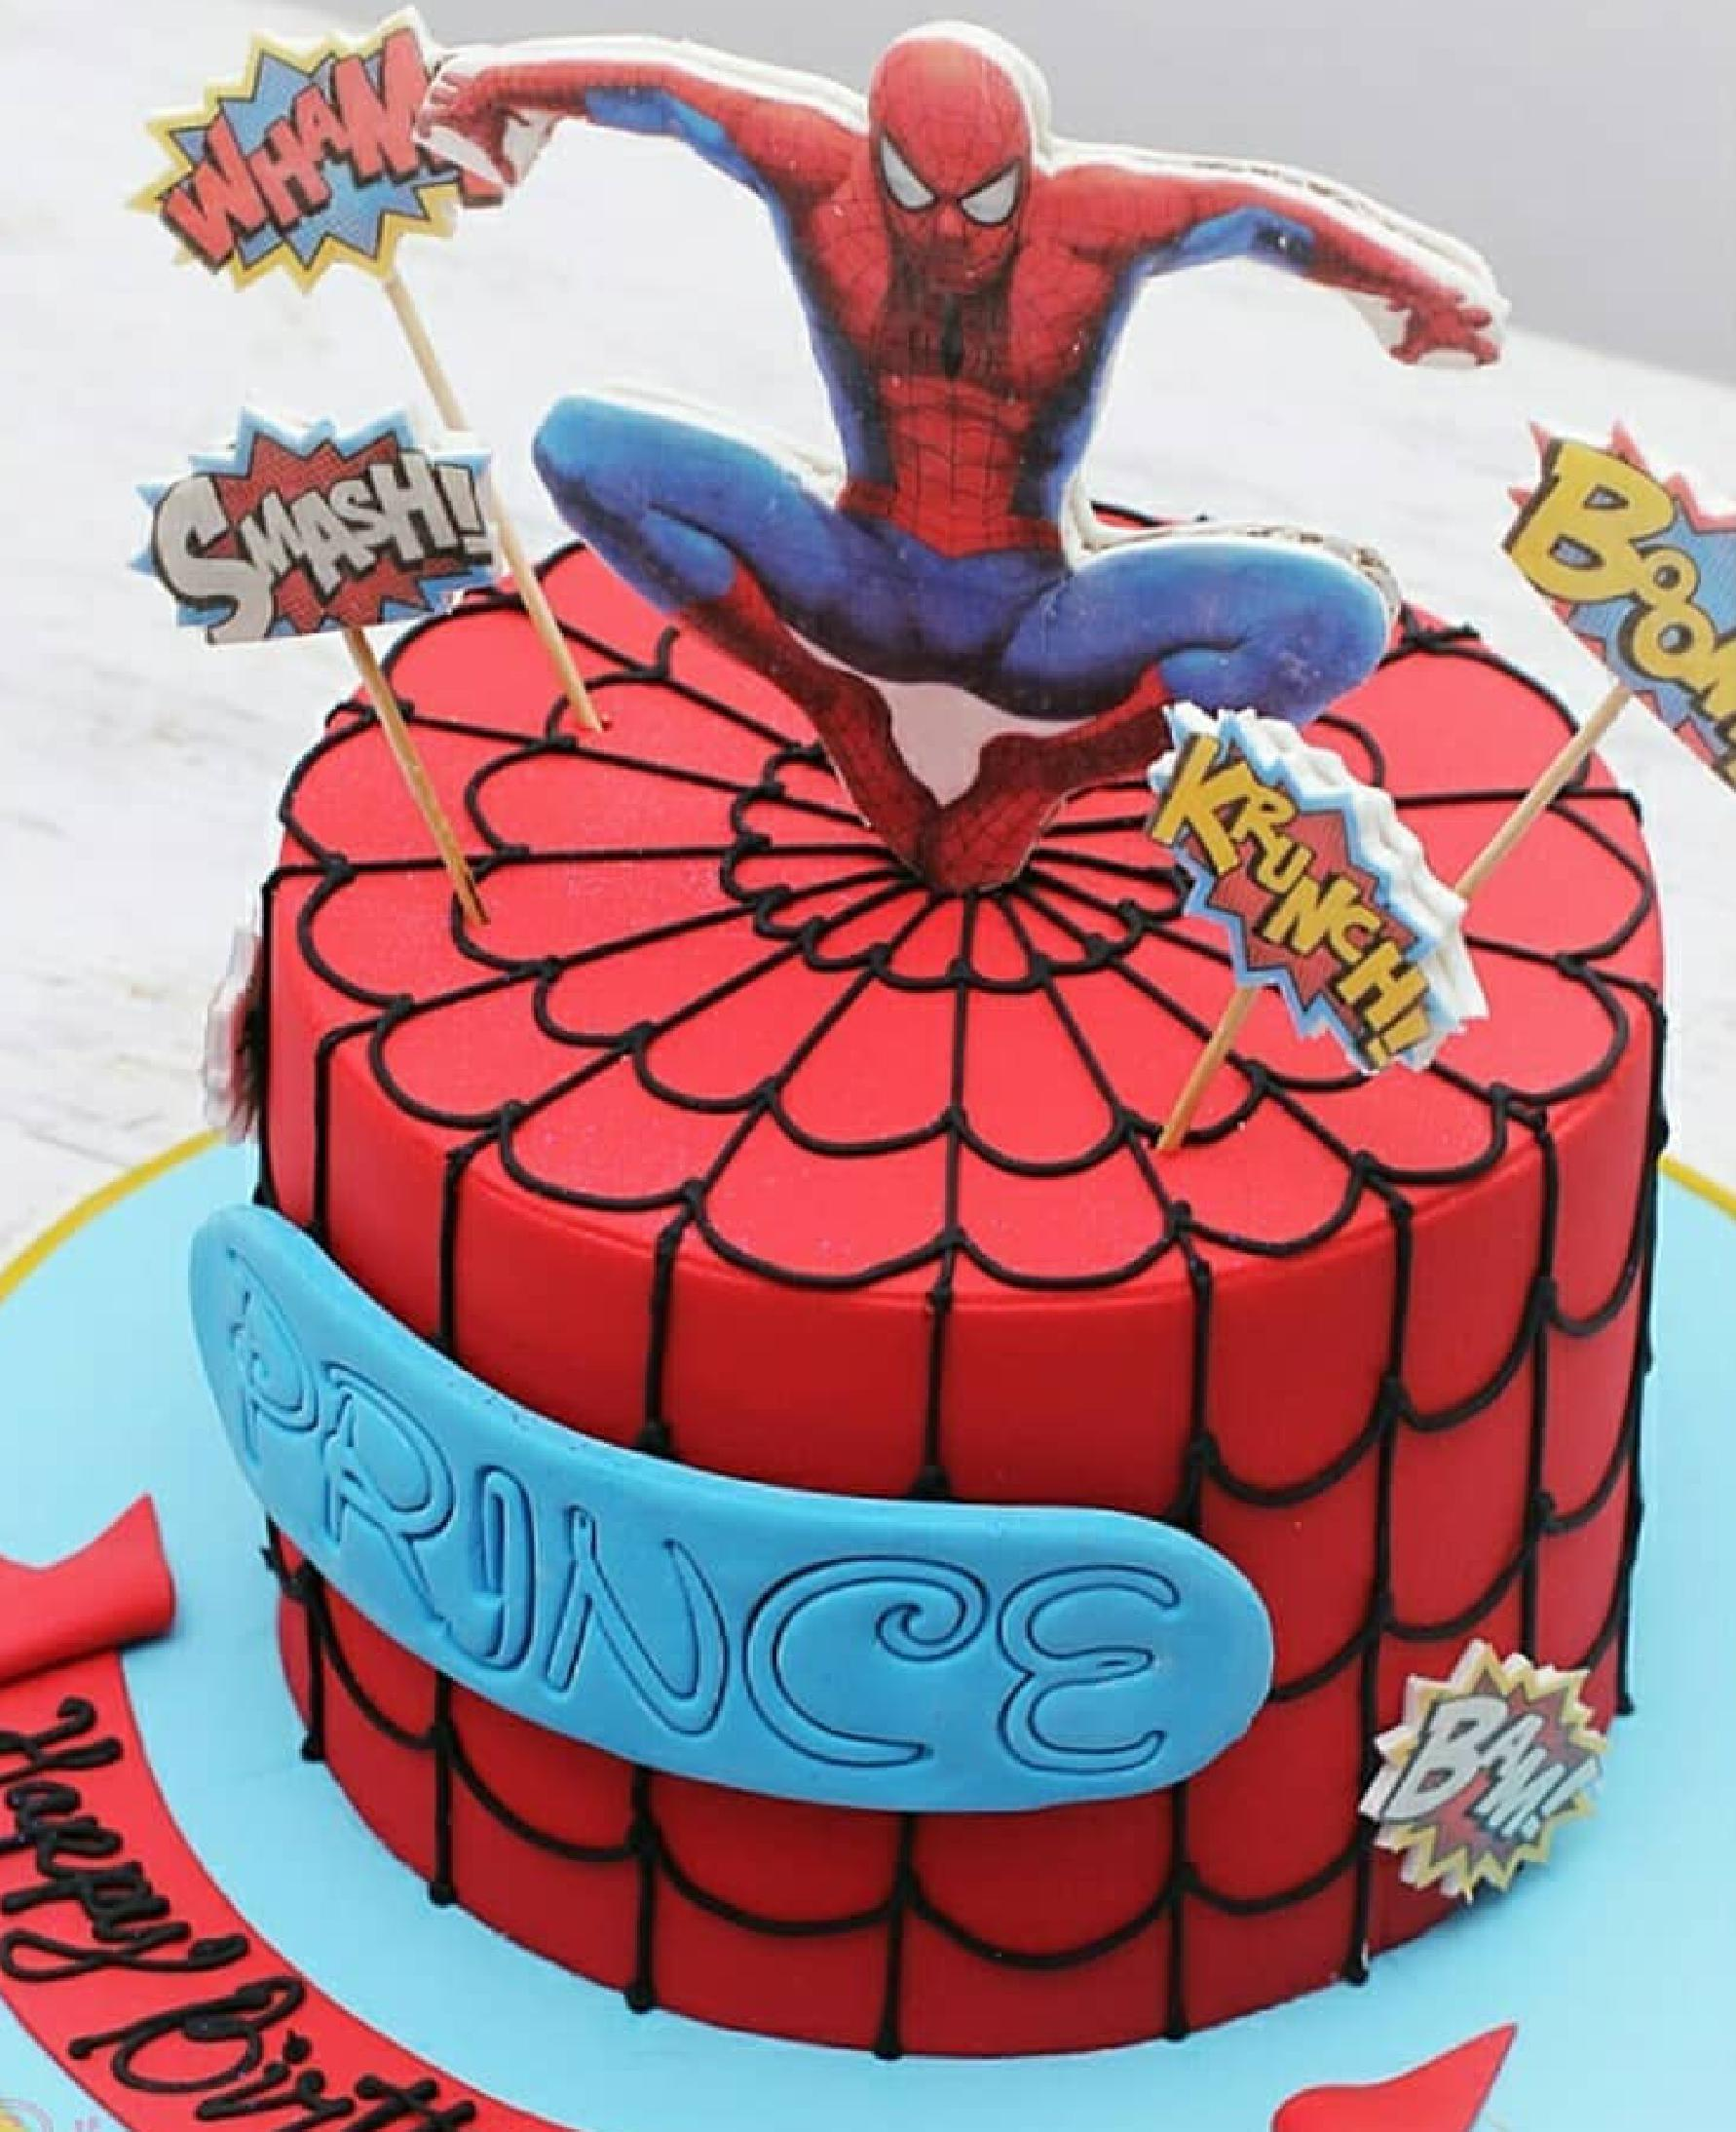 Spiderman Fondant Cake Dainty Affairs Bakery Cakes Cupcakes